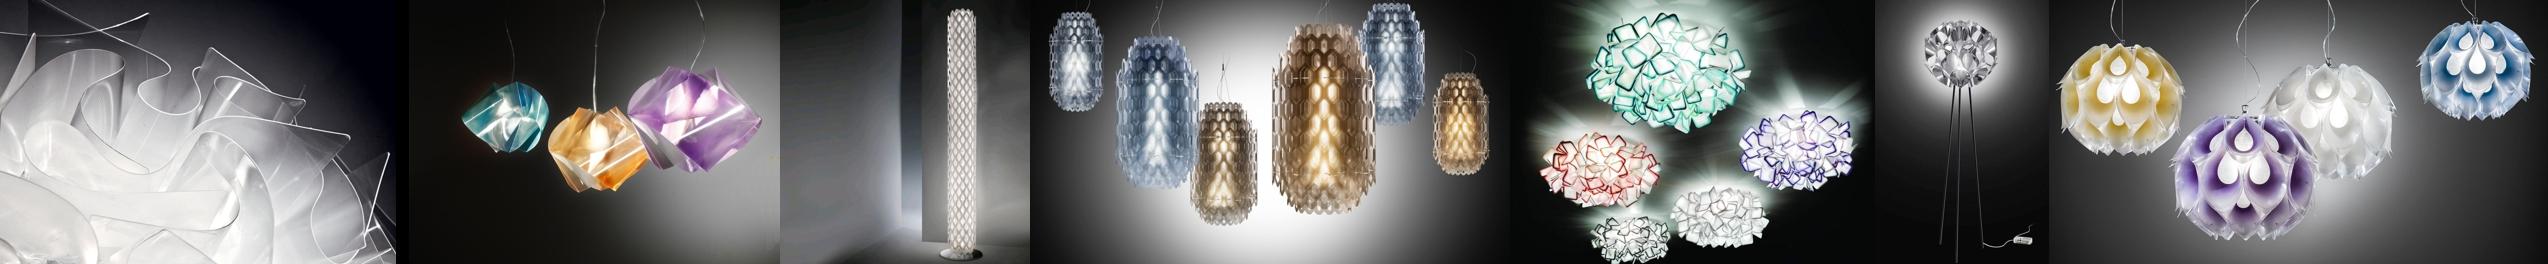 LAMPADE-SLAMP